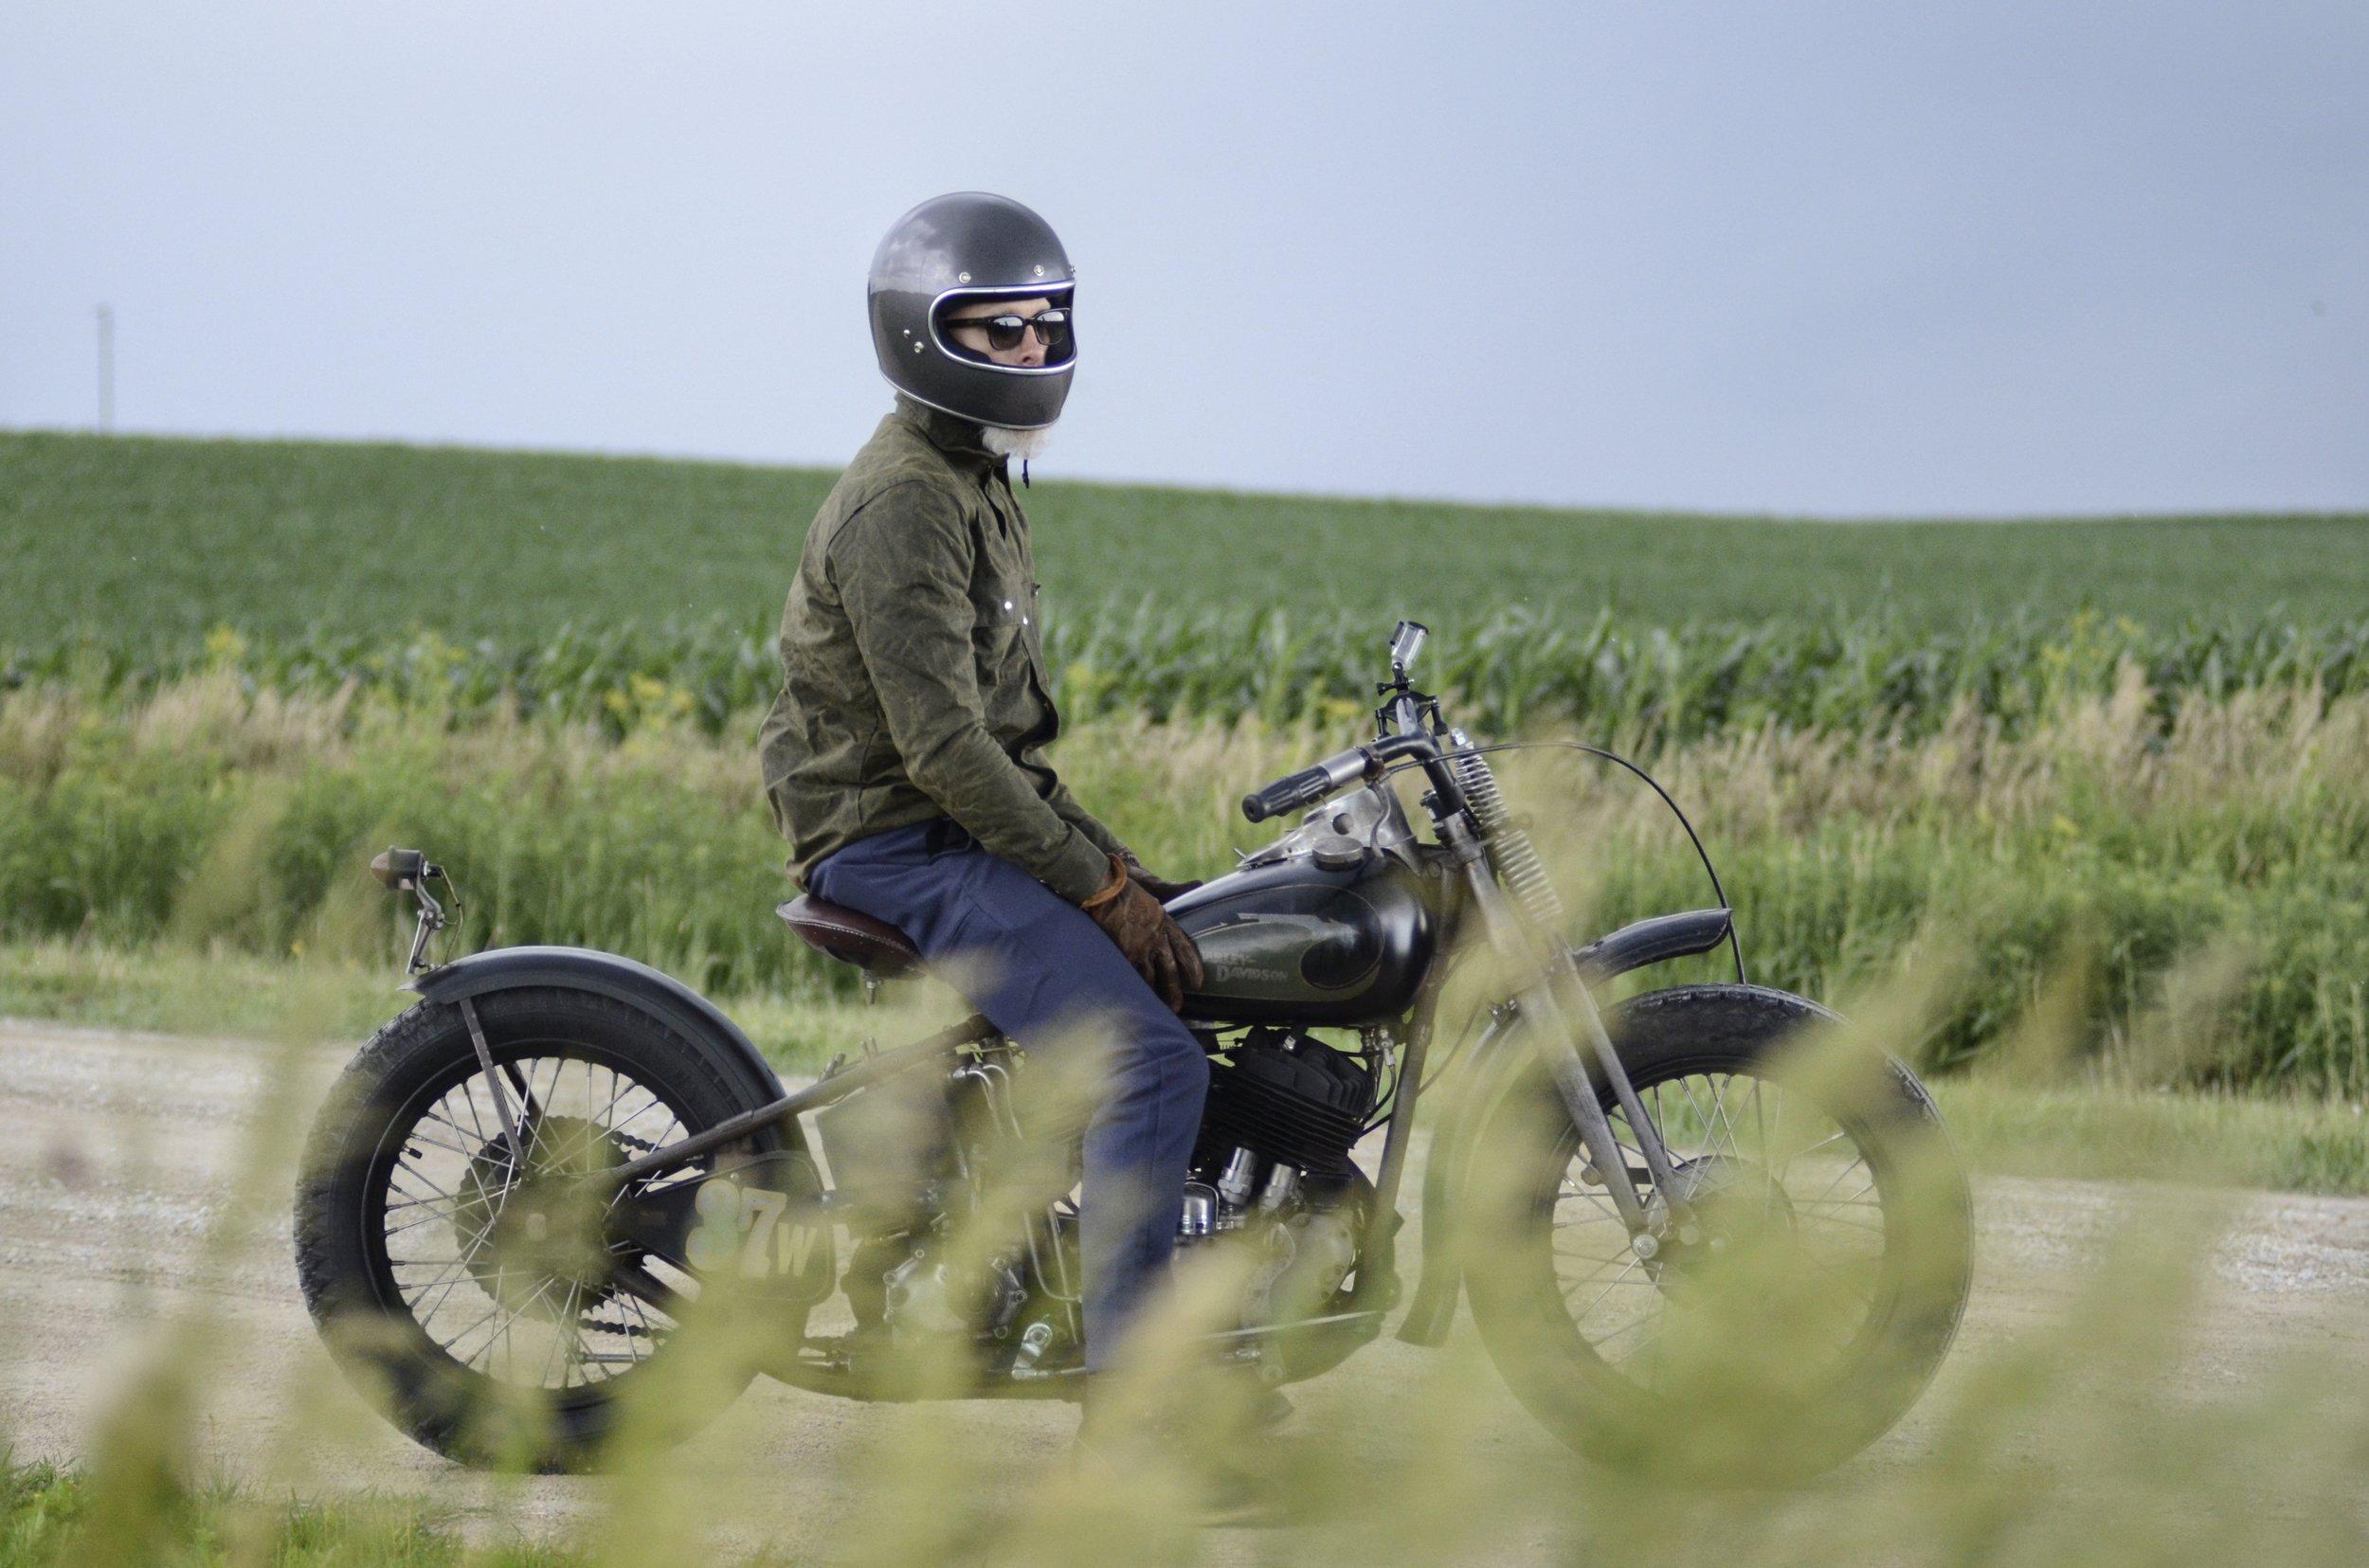 The Black Bear Brand x Harley Davidson journey